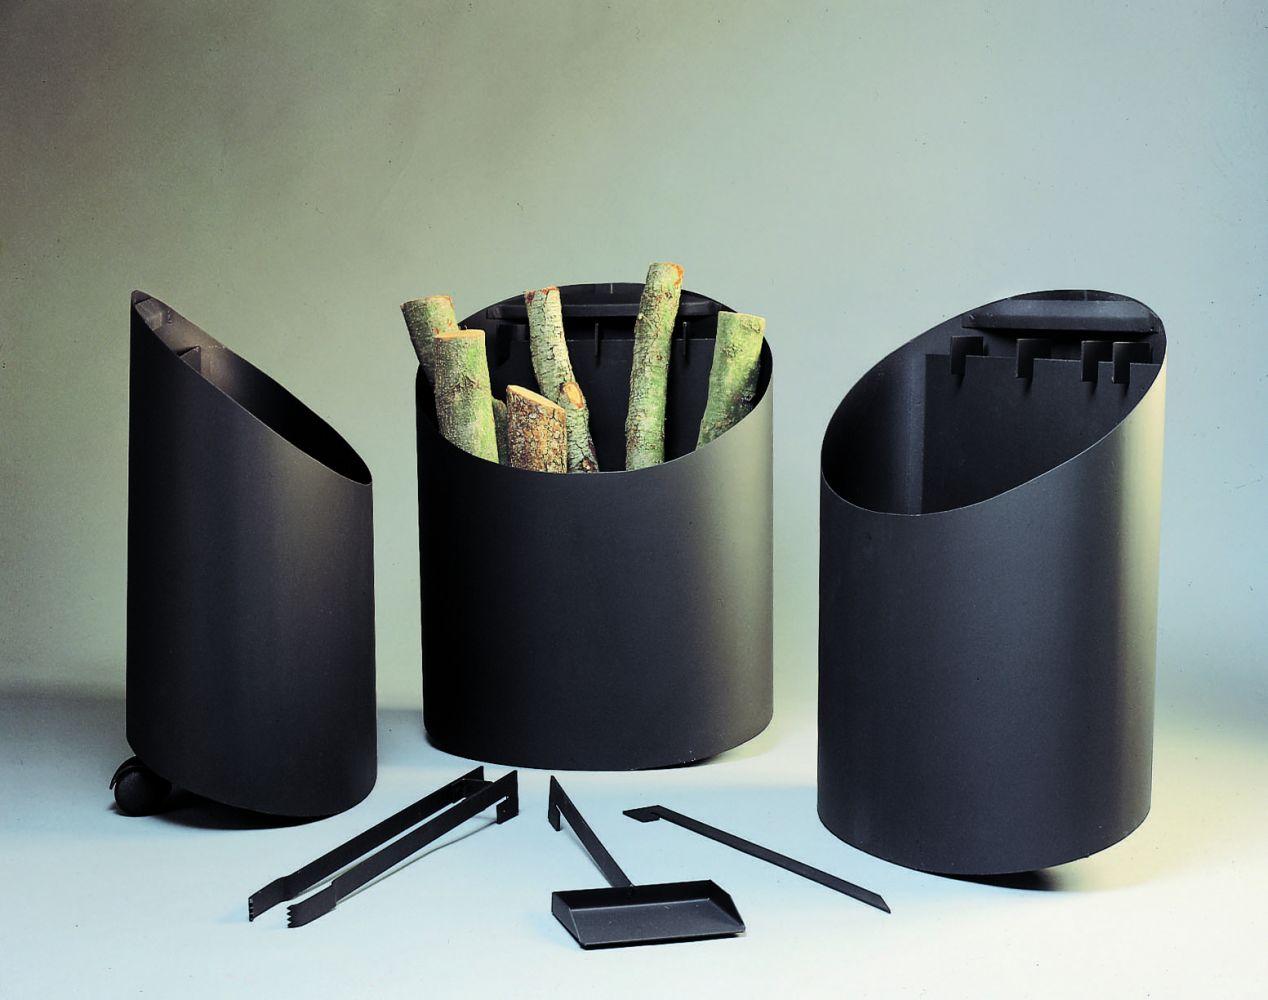 Brennholzablage Kamin Moderne Design